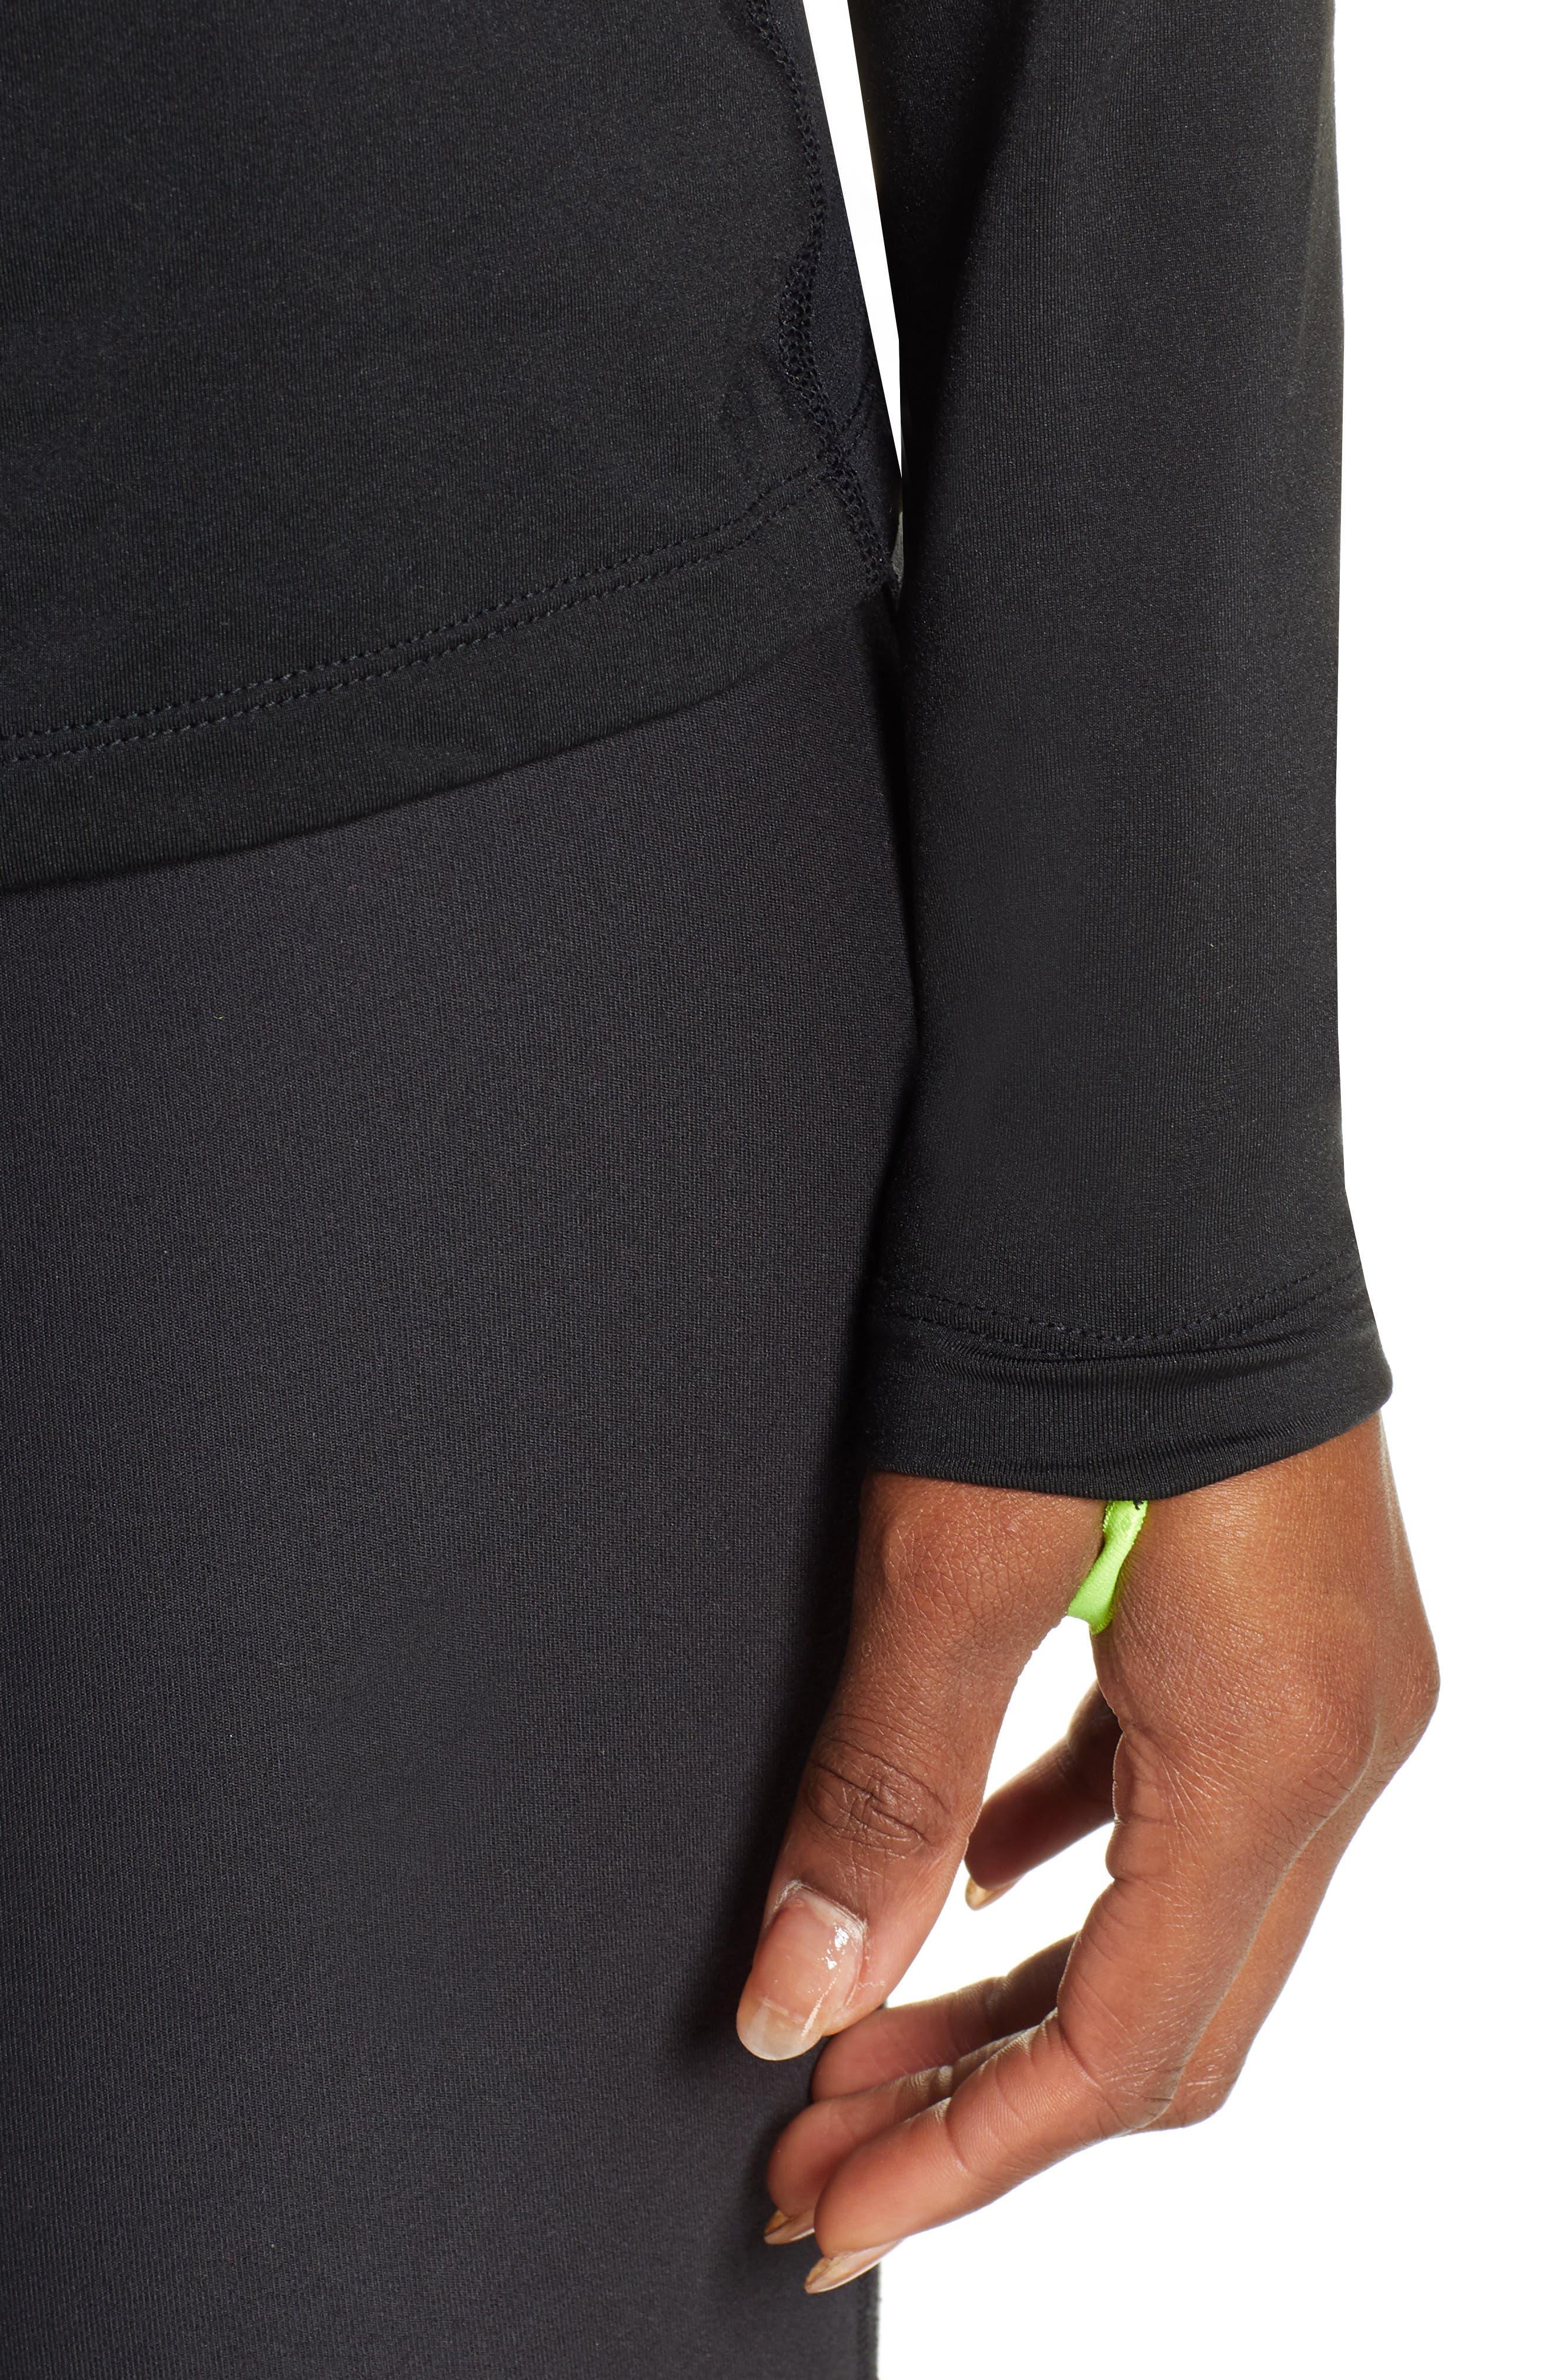 NIKE, Element Long-Sleeve Running Top, Alternate thumbnail 5, color, BLACK